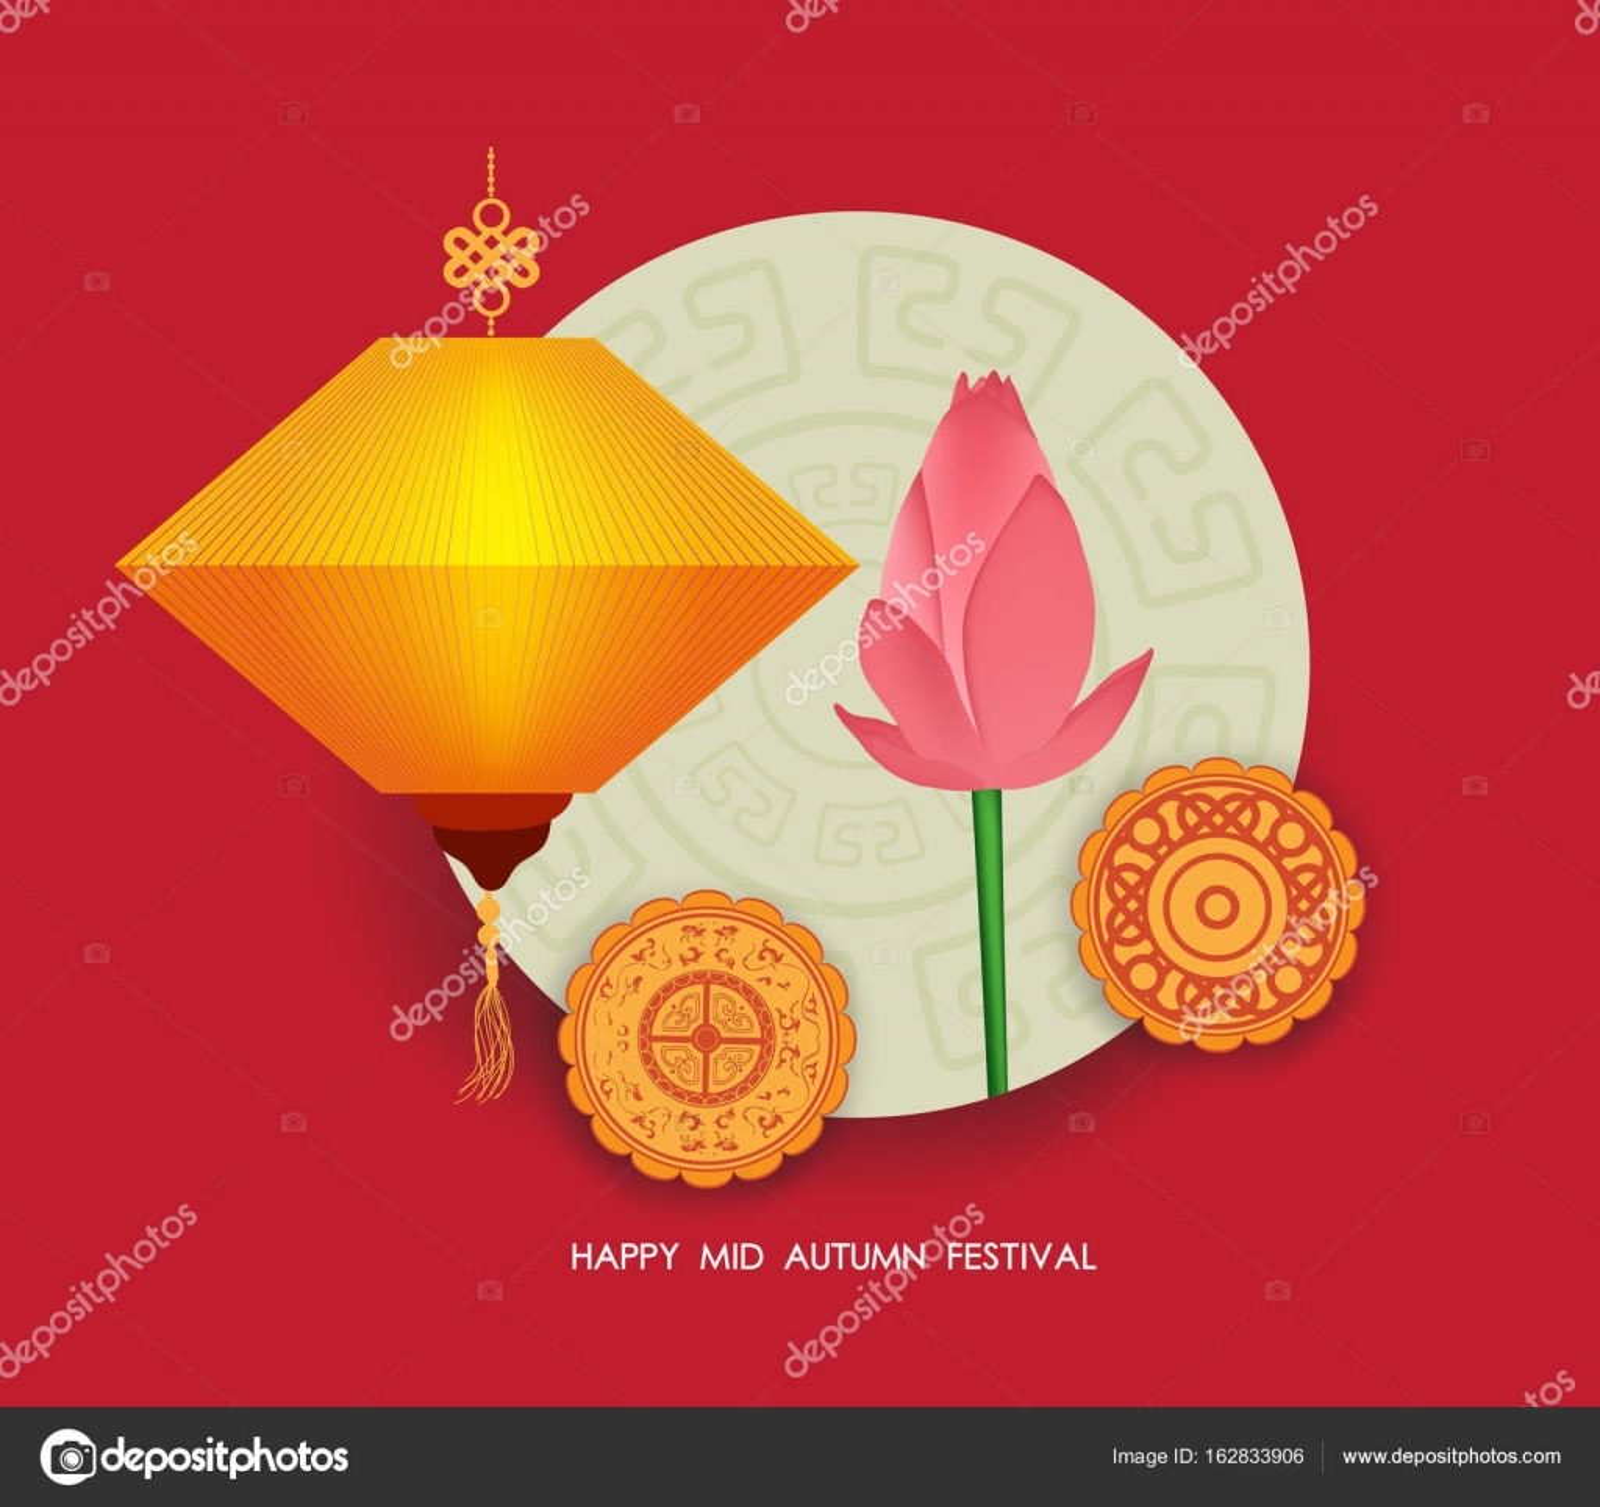 Autumn lantern festival background with moon cake and lotus happy autumn lantern festival background with moon cake and lotus happy mid autumn festival stock m4hsunfo